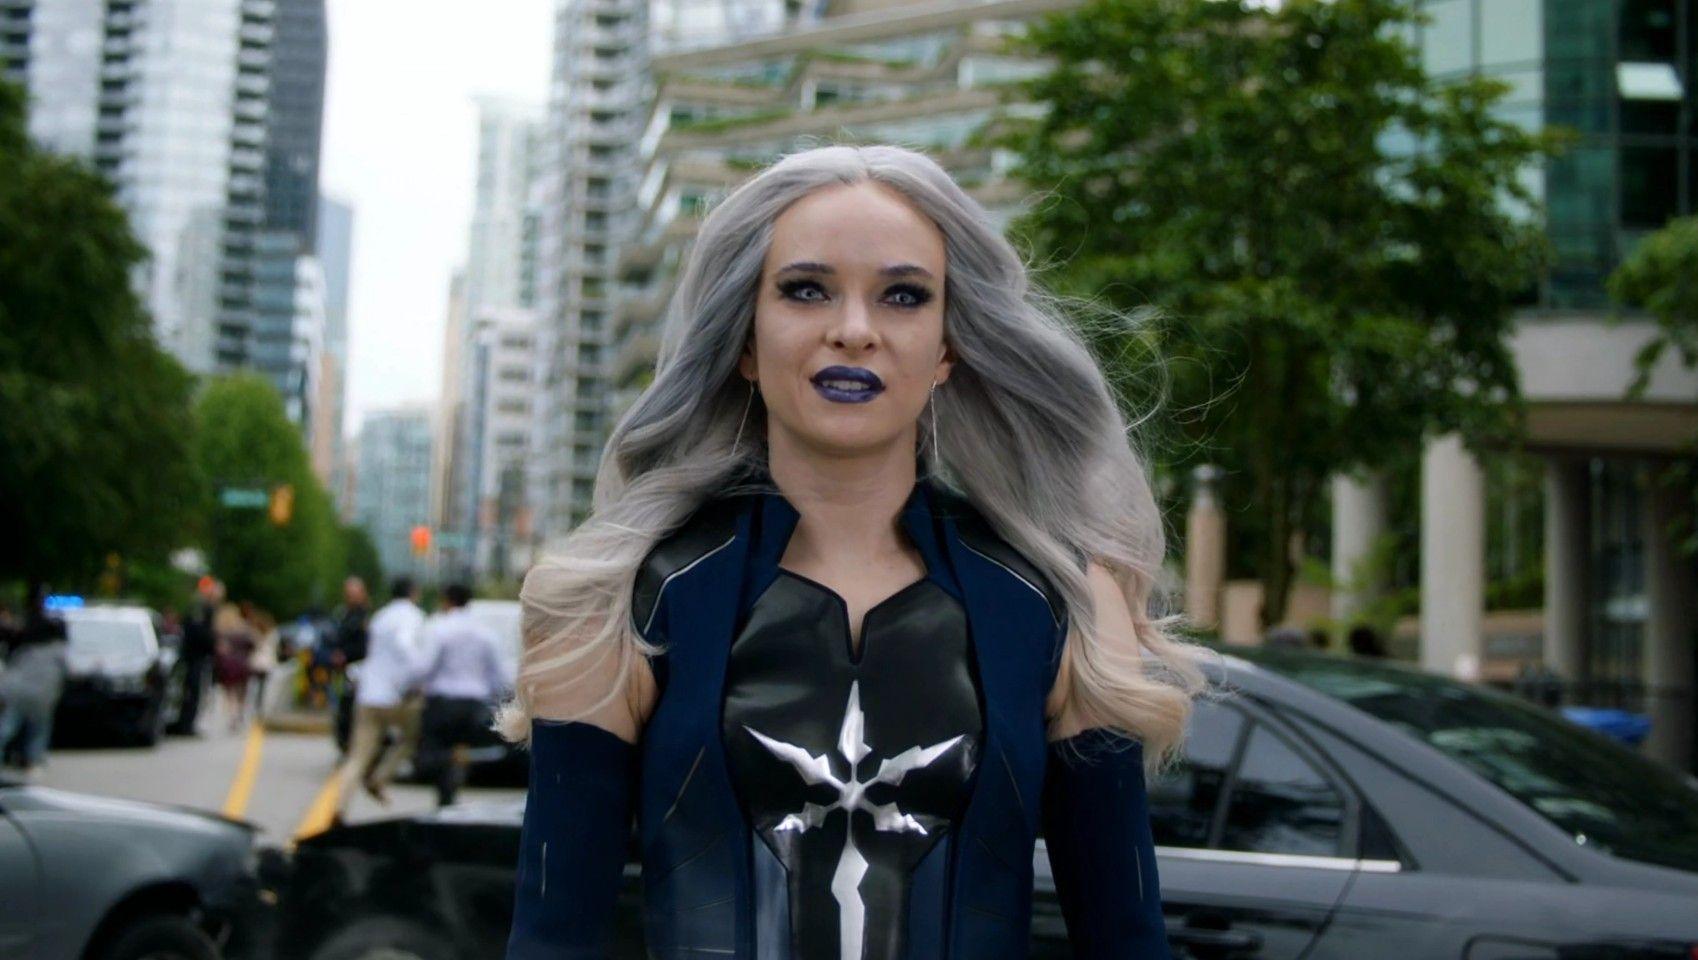 The Flash 4: che ruolo avrà Caitlin Snow aka Killer Frost